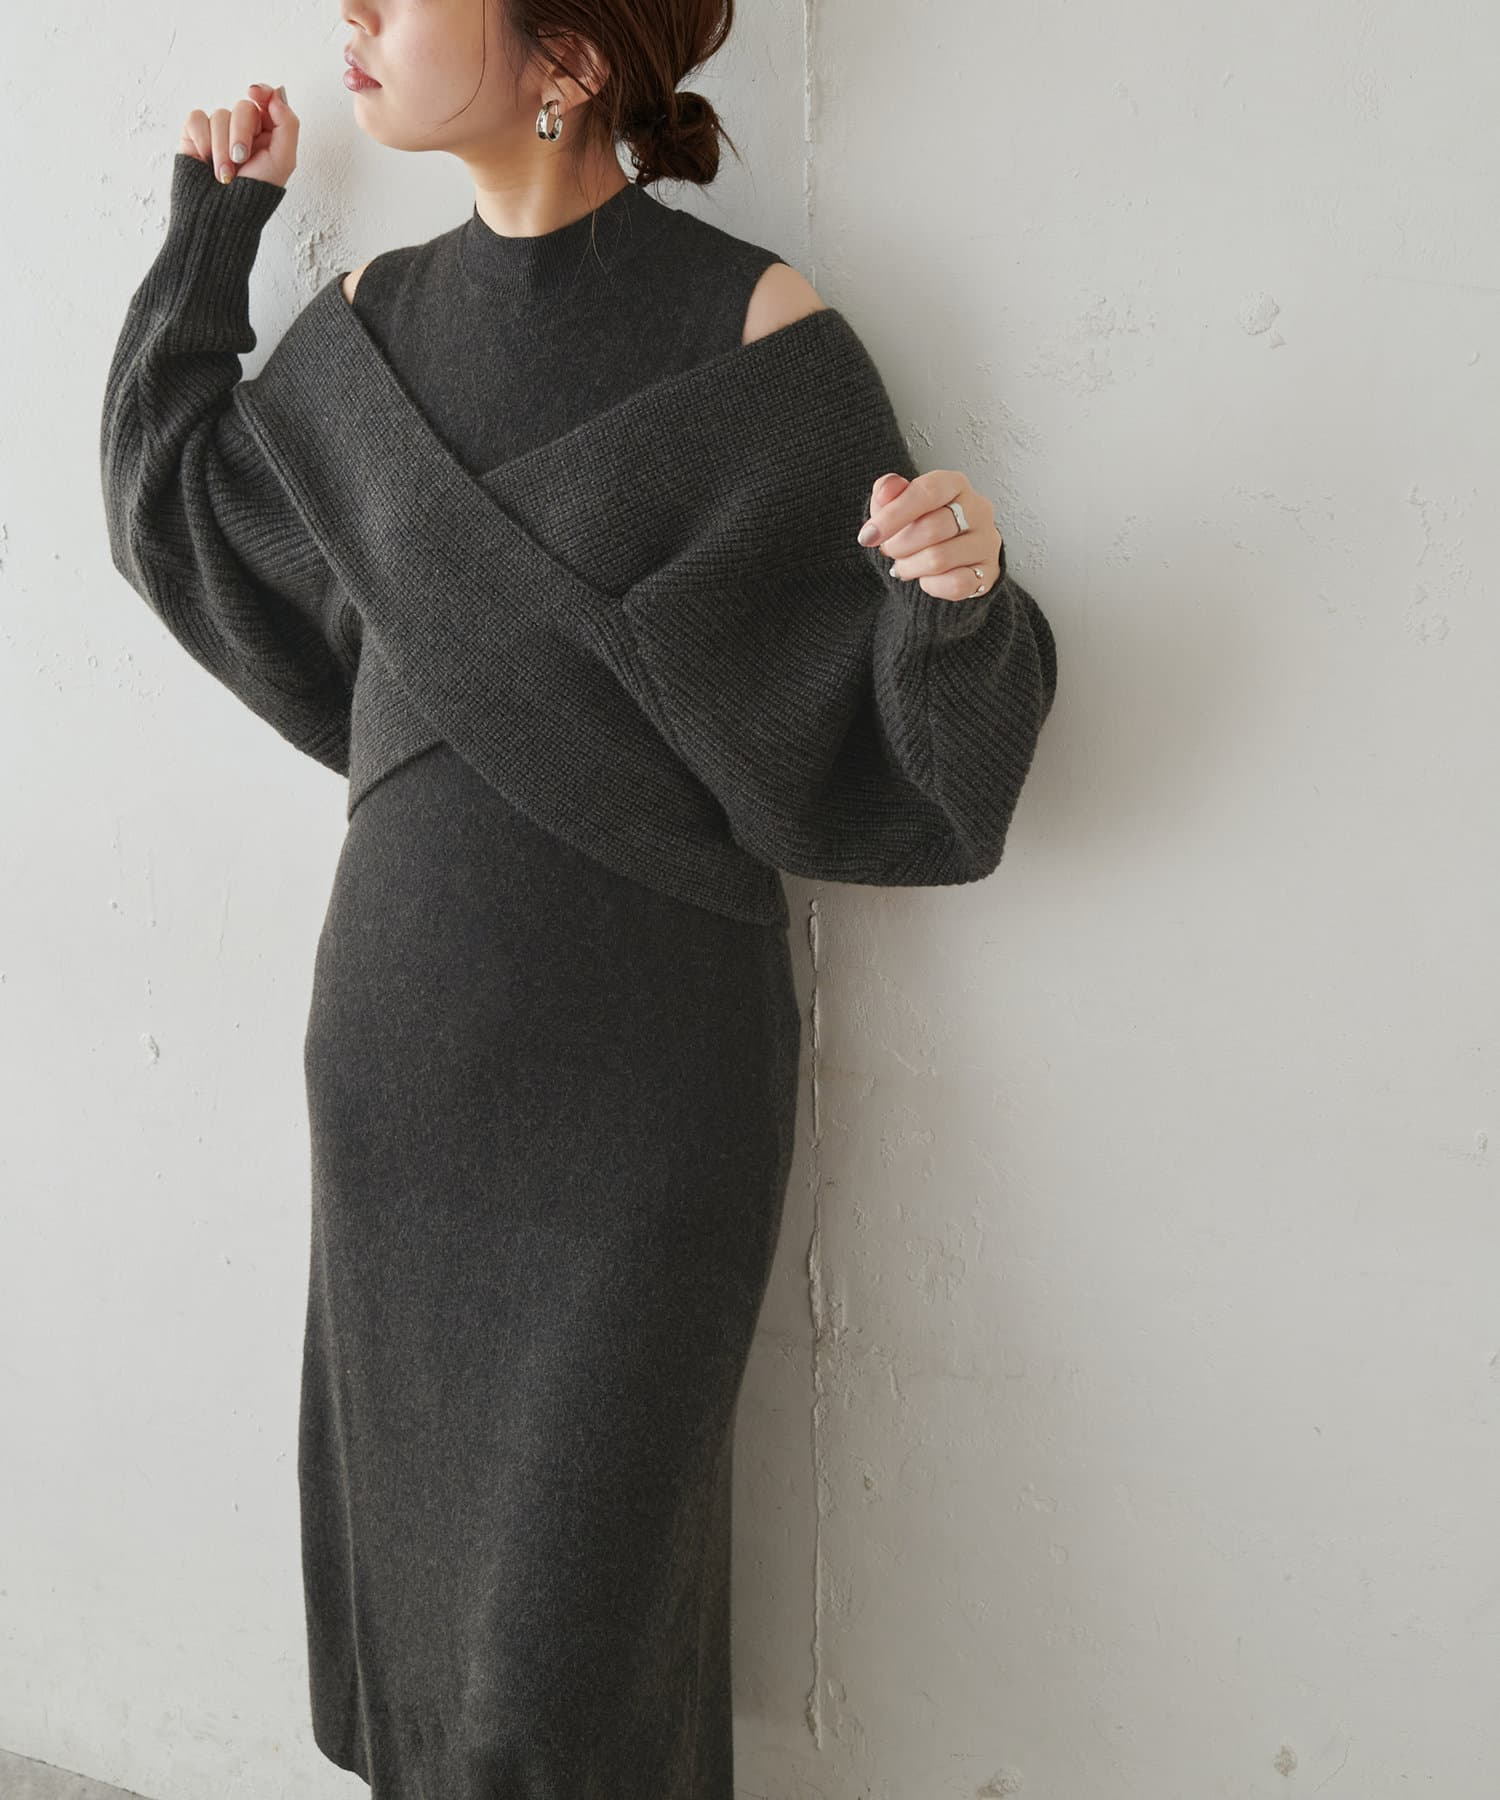 natural couture(ナチュラルクチュール) 【WEB限定・大好評リバイバルアイテム】クロスニット+ノースリワンピースセット